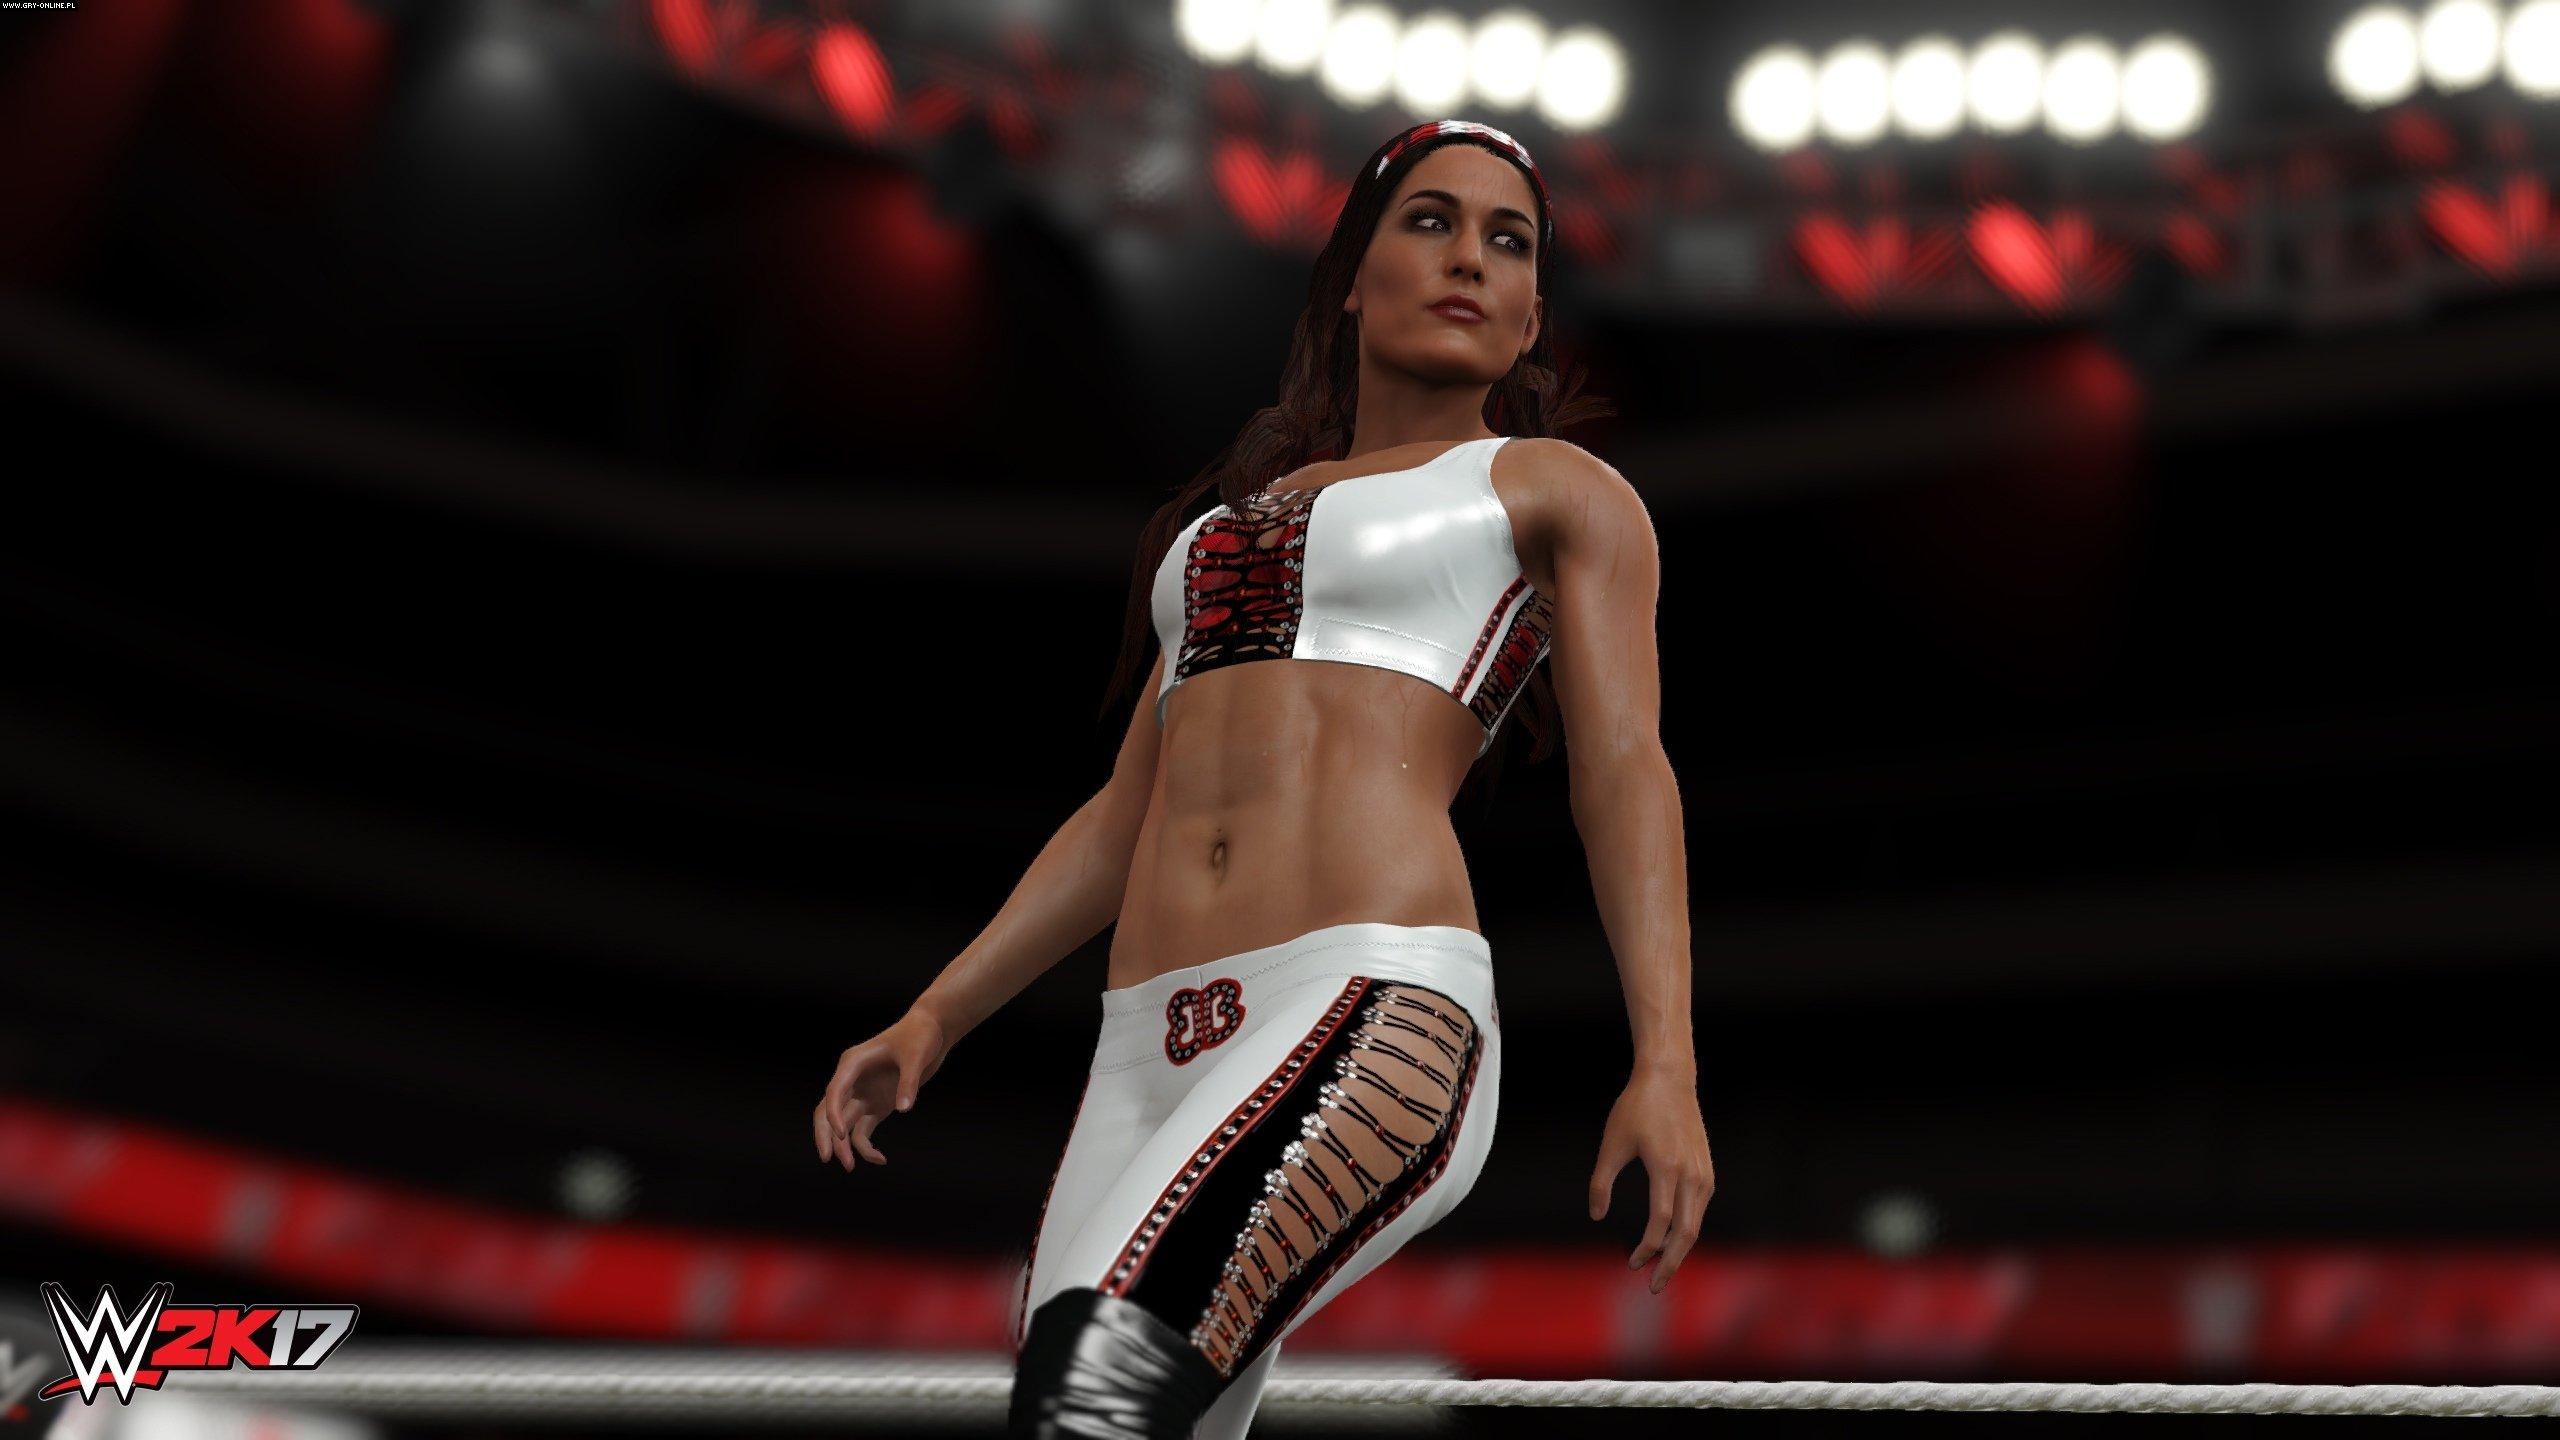 WWE 2K17 PS4, XONE, X360, PS3 Games Image 15/18, Yuke's, 2K Games